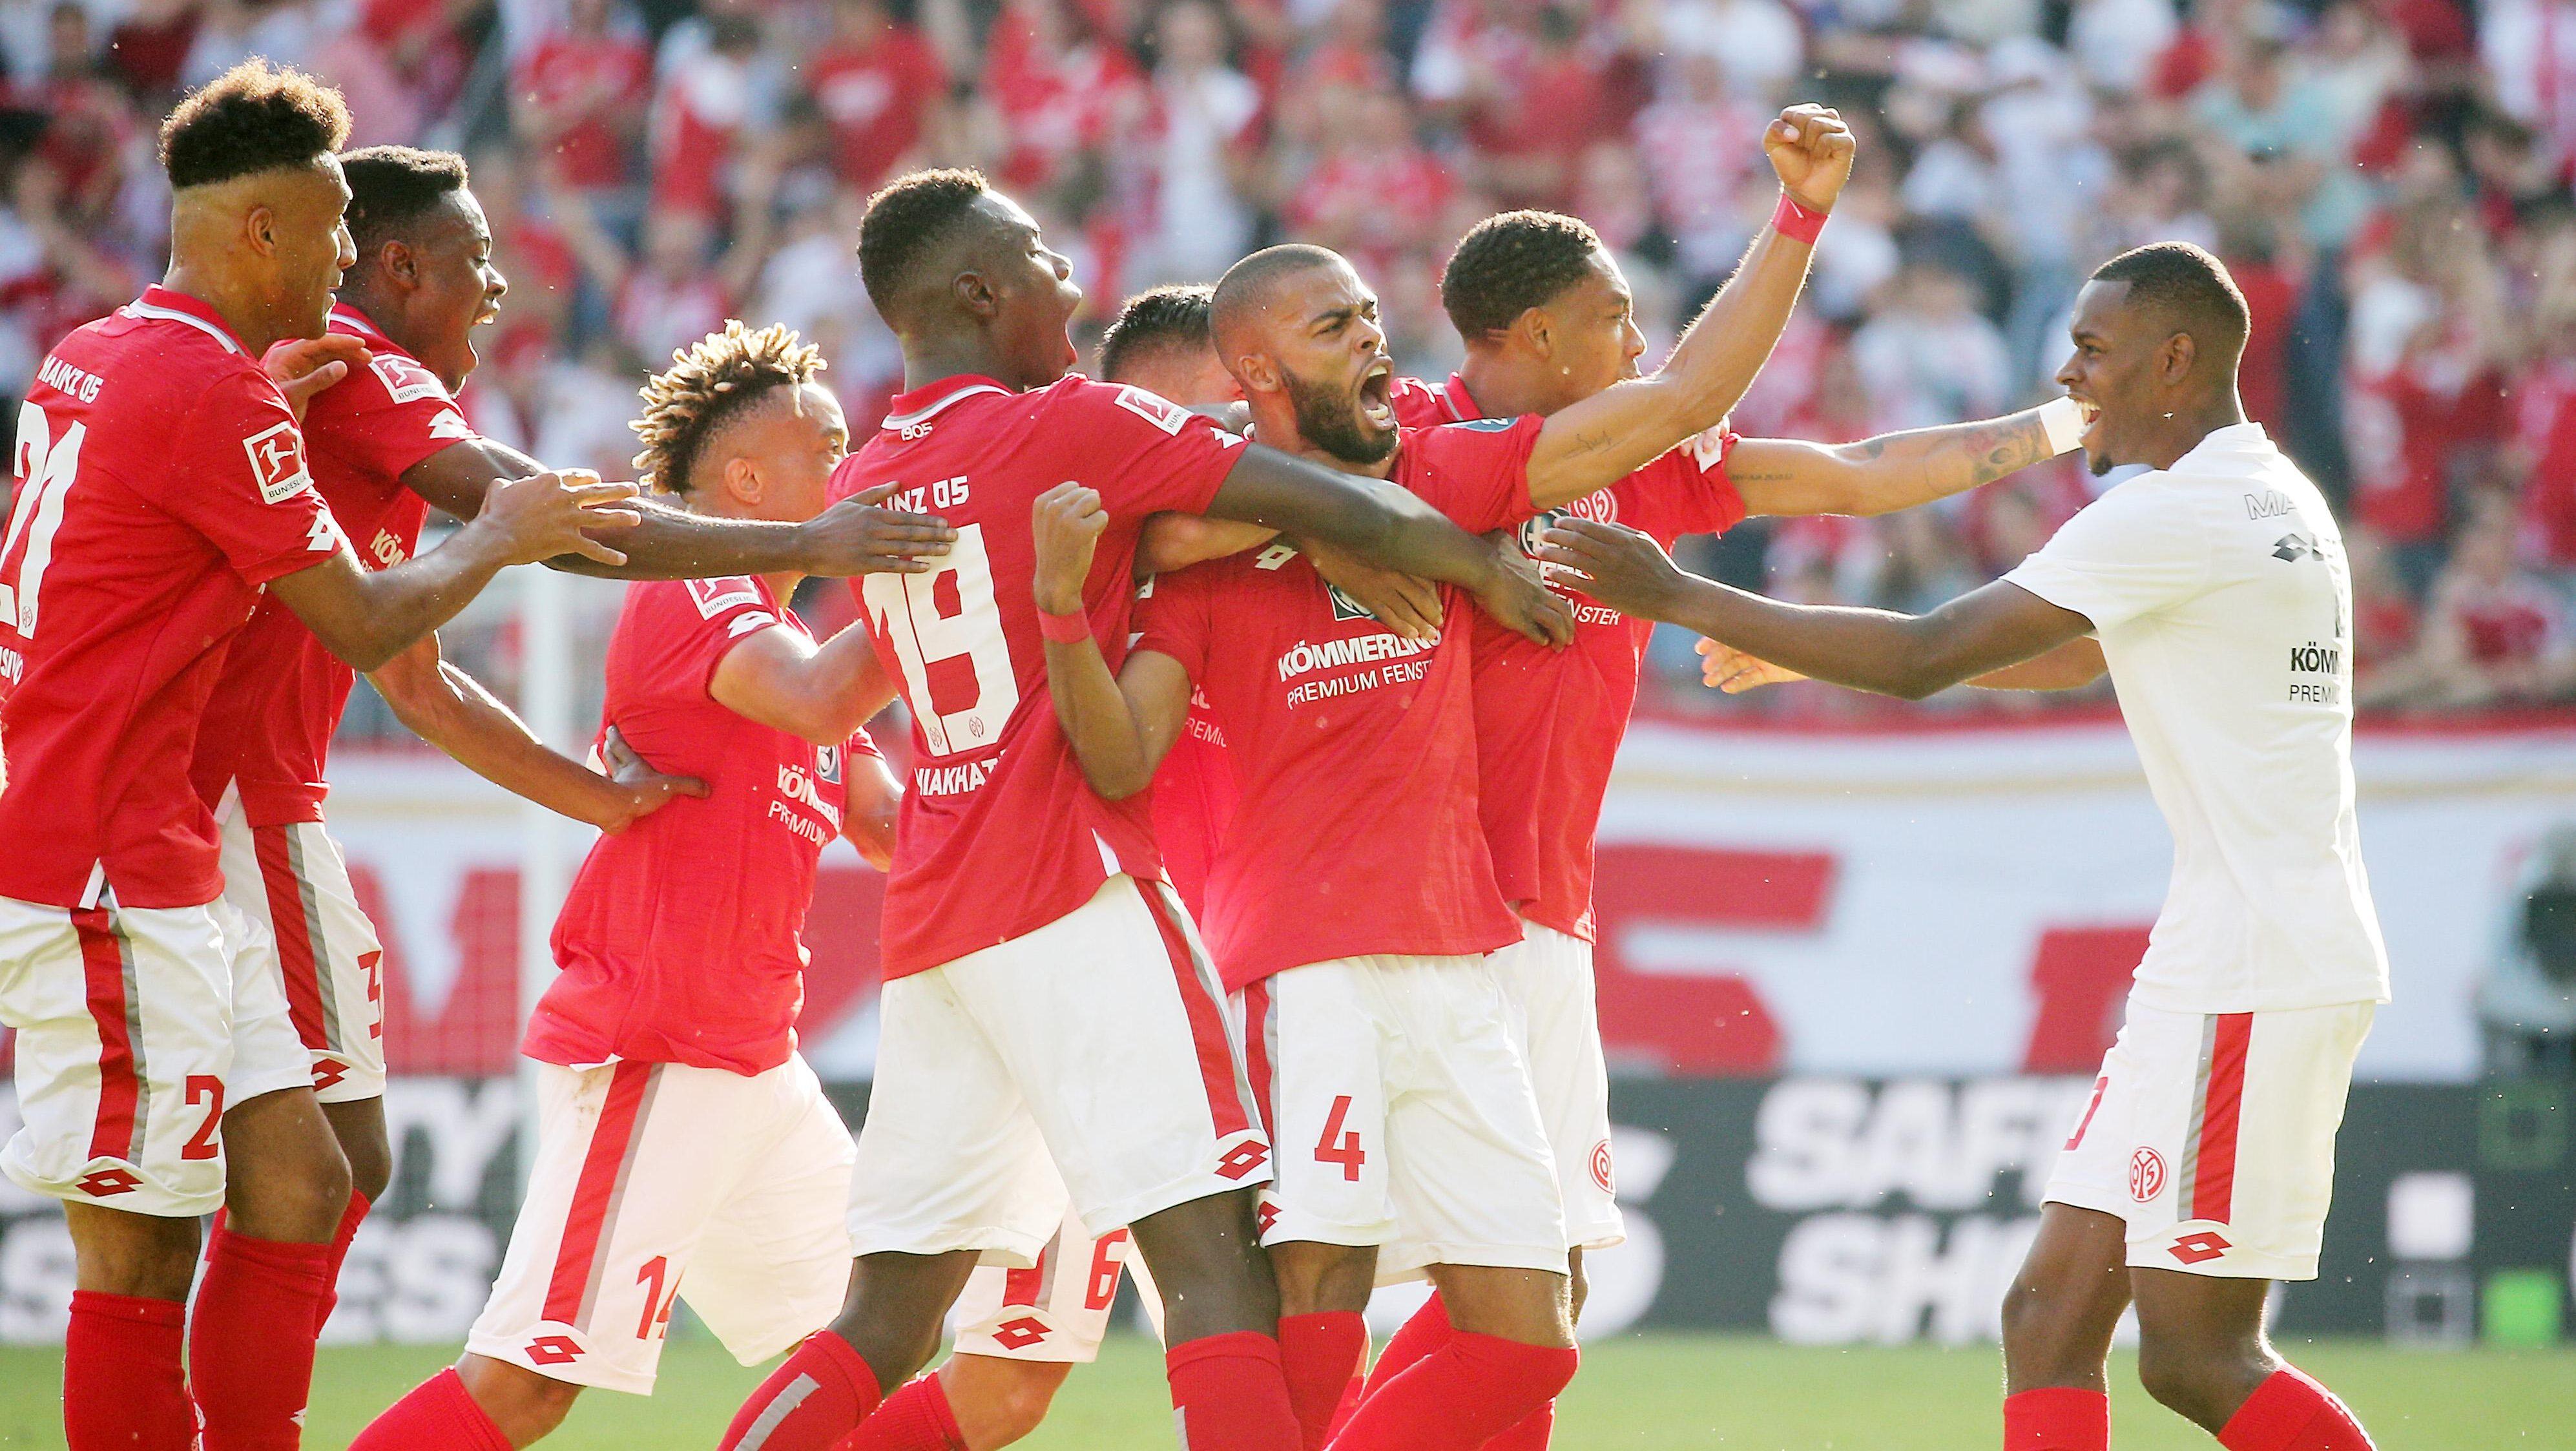 1. FSV Mainz 05 ringt Hertha BSC nieder